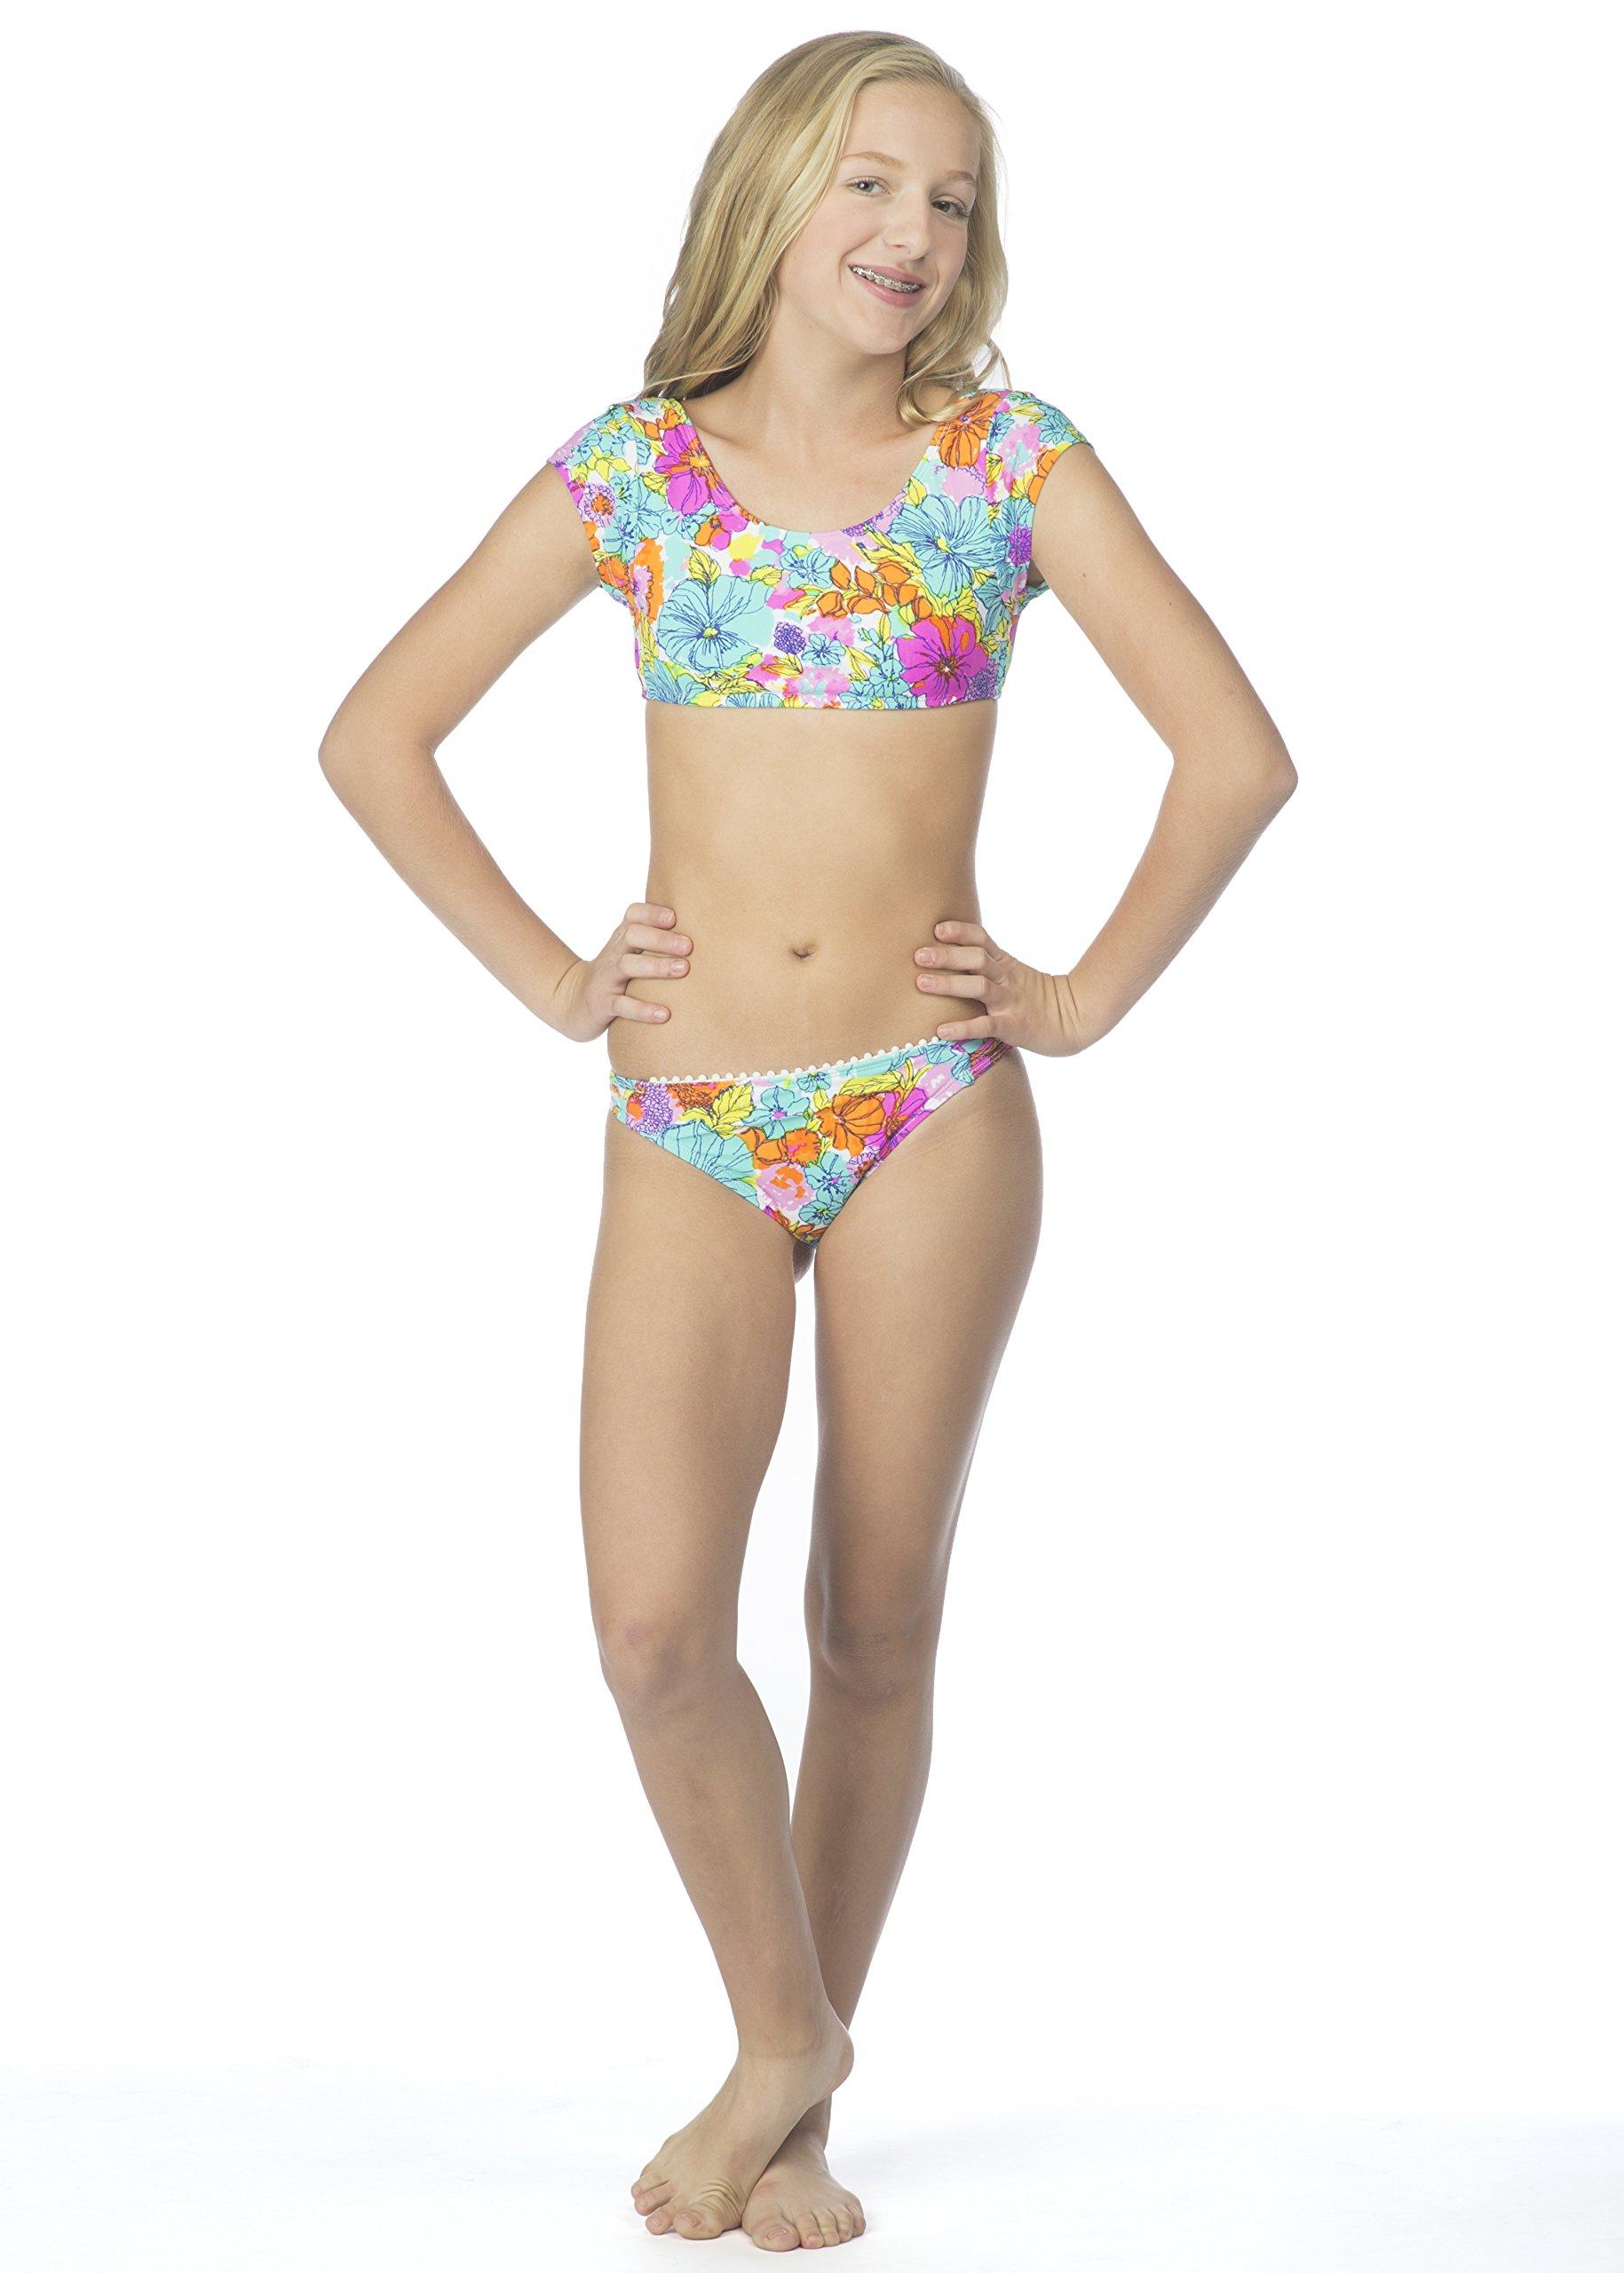 Hobie Big Girls' Fleur to Love Two Piece Short Sleeve Crop Hipster Swimsuit, Multi, 7